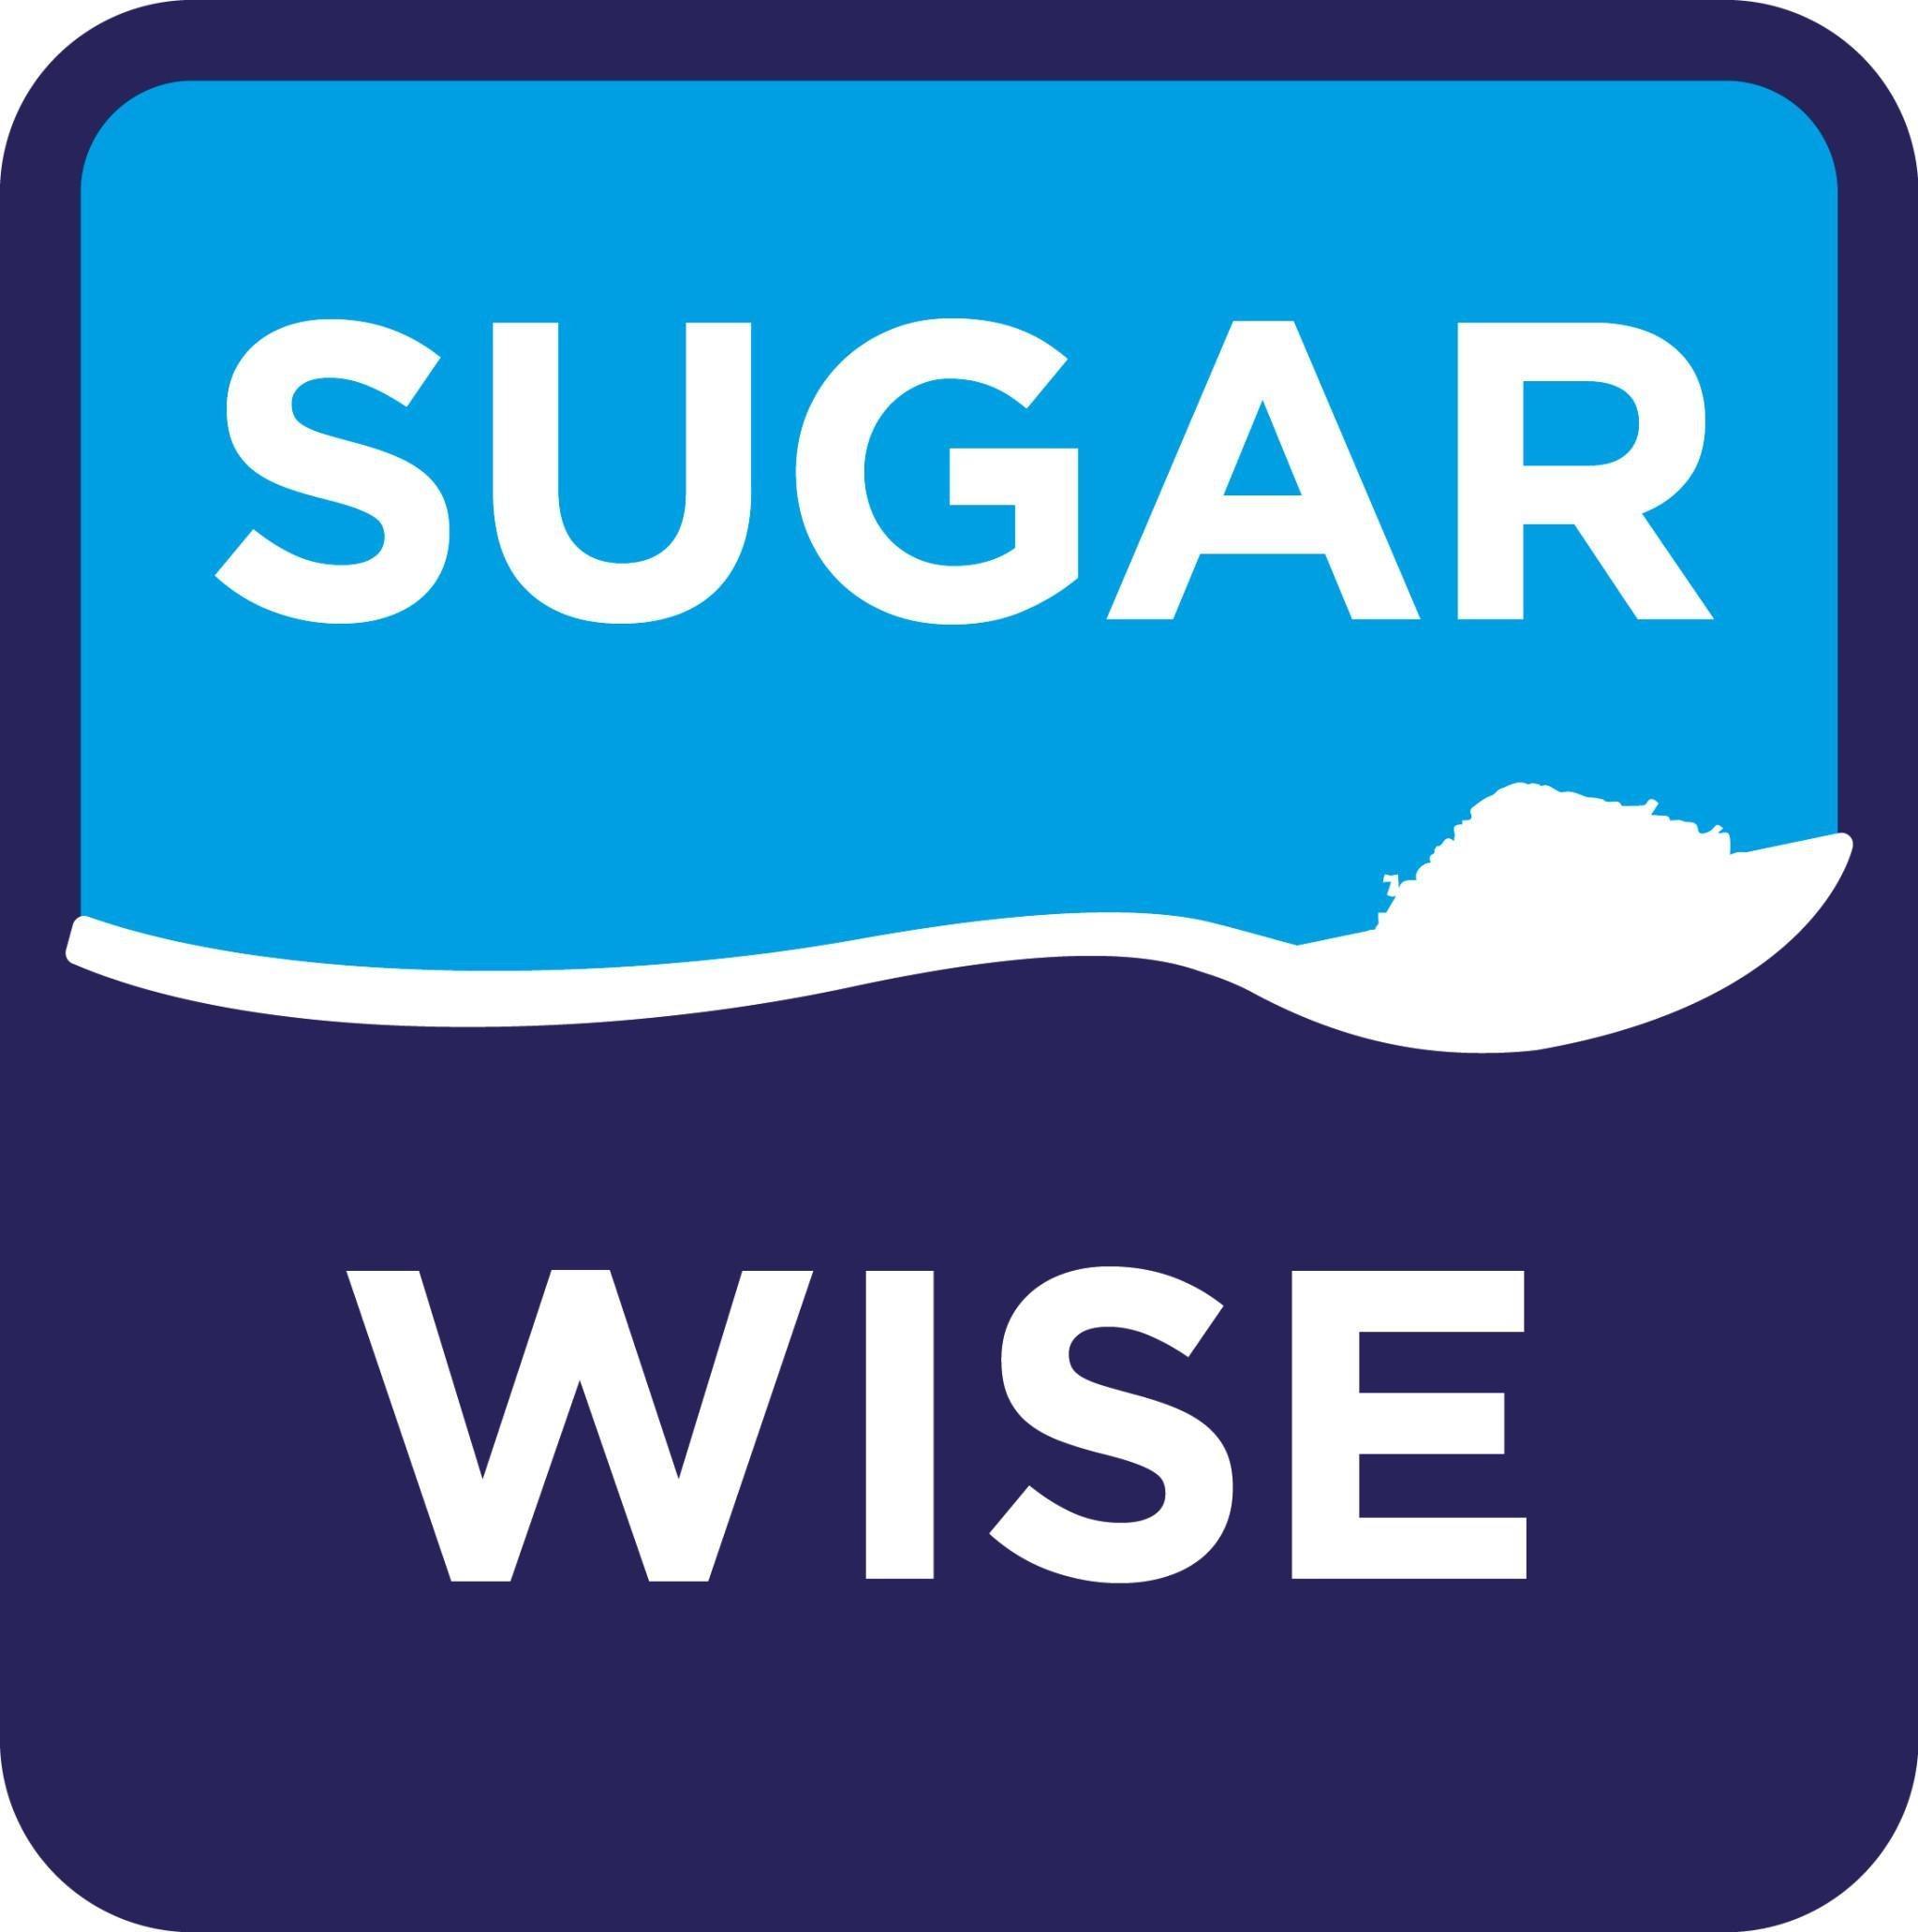 Tesco Develops Sugar Certification Logo To The Delight Of Cambridge Mum